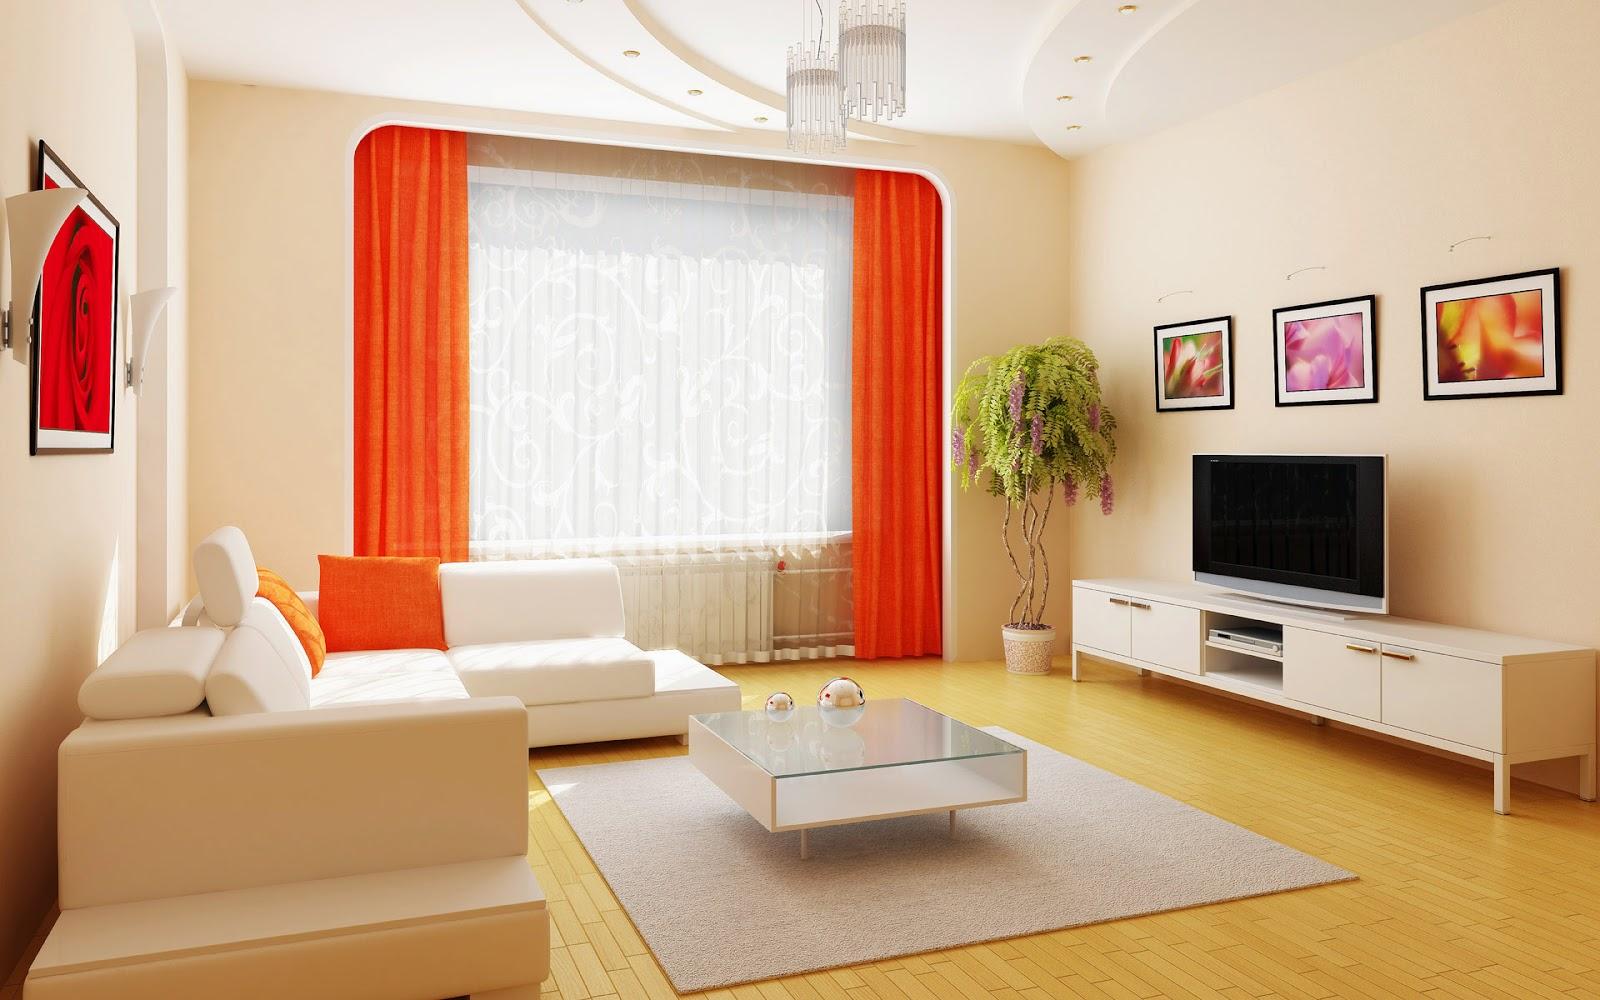 4 Contoh Desain Ruang Keluarga Yang Perlu Kamu Ketahui